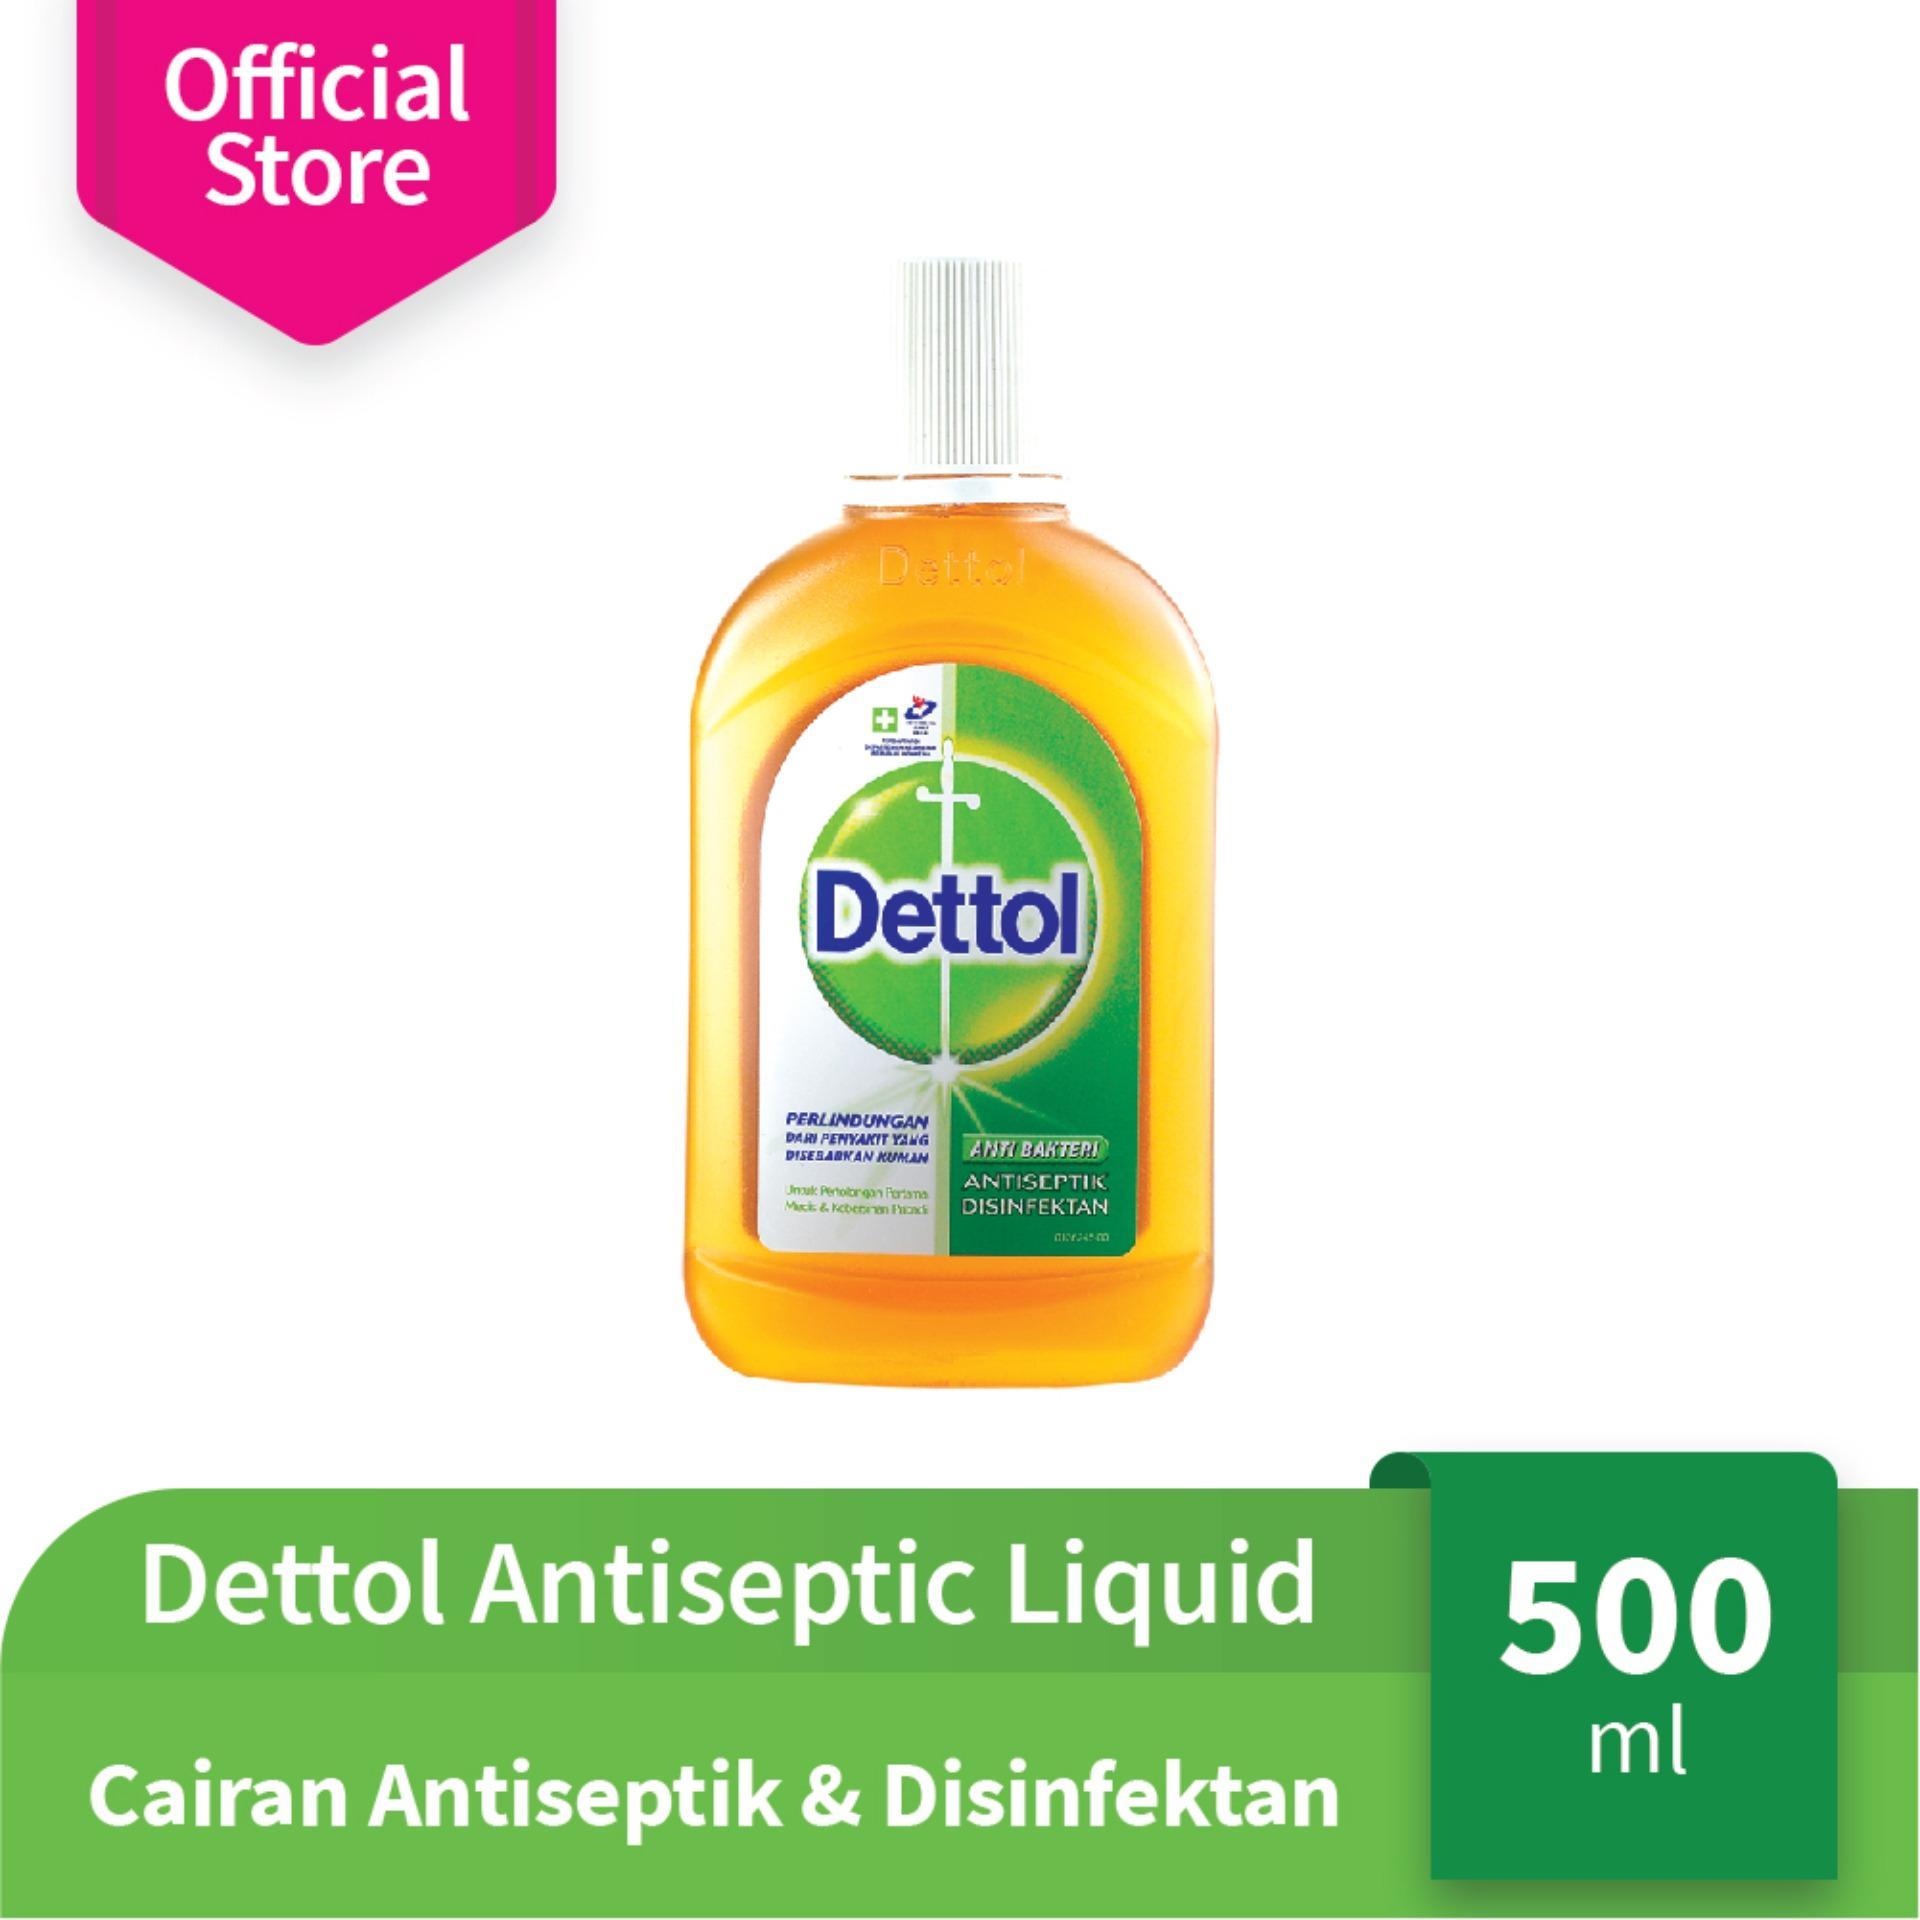 Harga Dettol Antiseptic Liquid Botol 500Ml Cairan Antiseptik Disinfektan Dettol Dki Jakarta